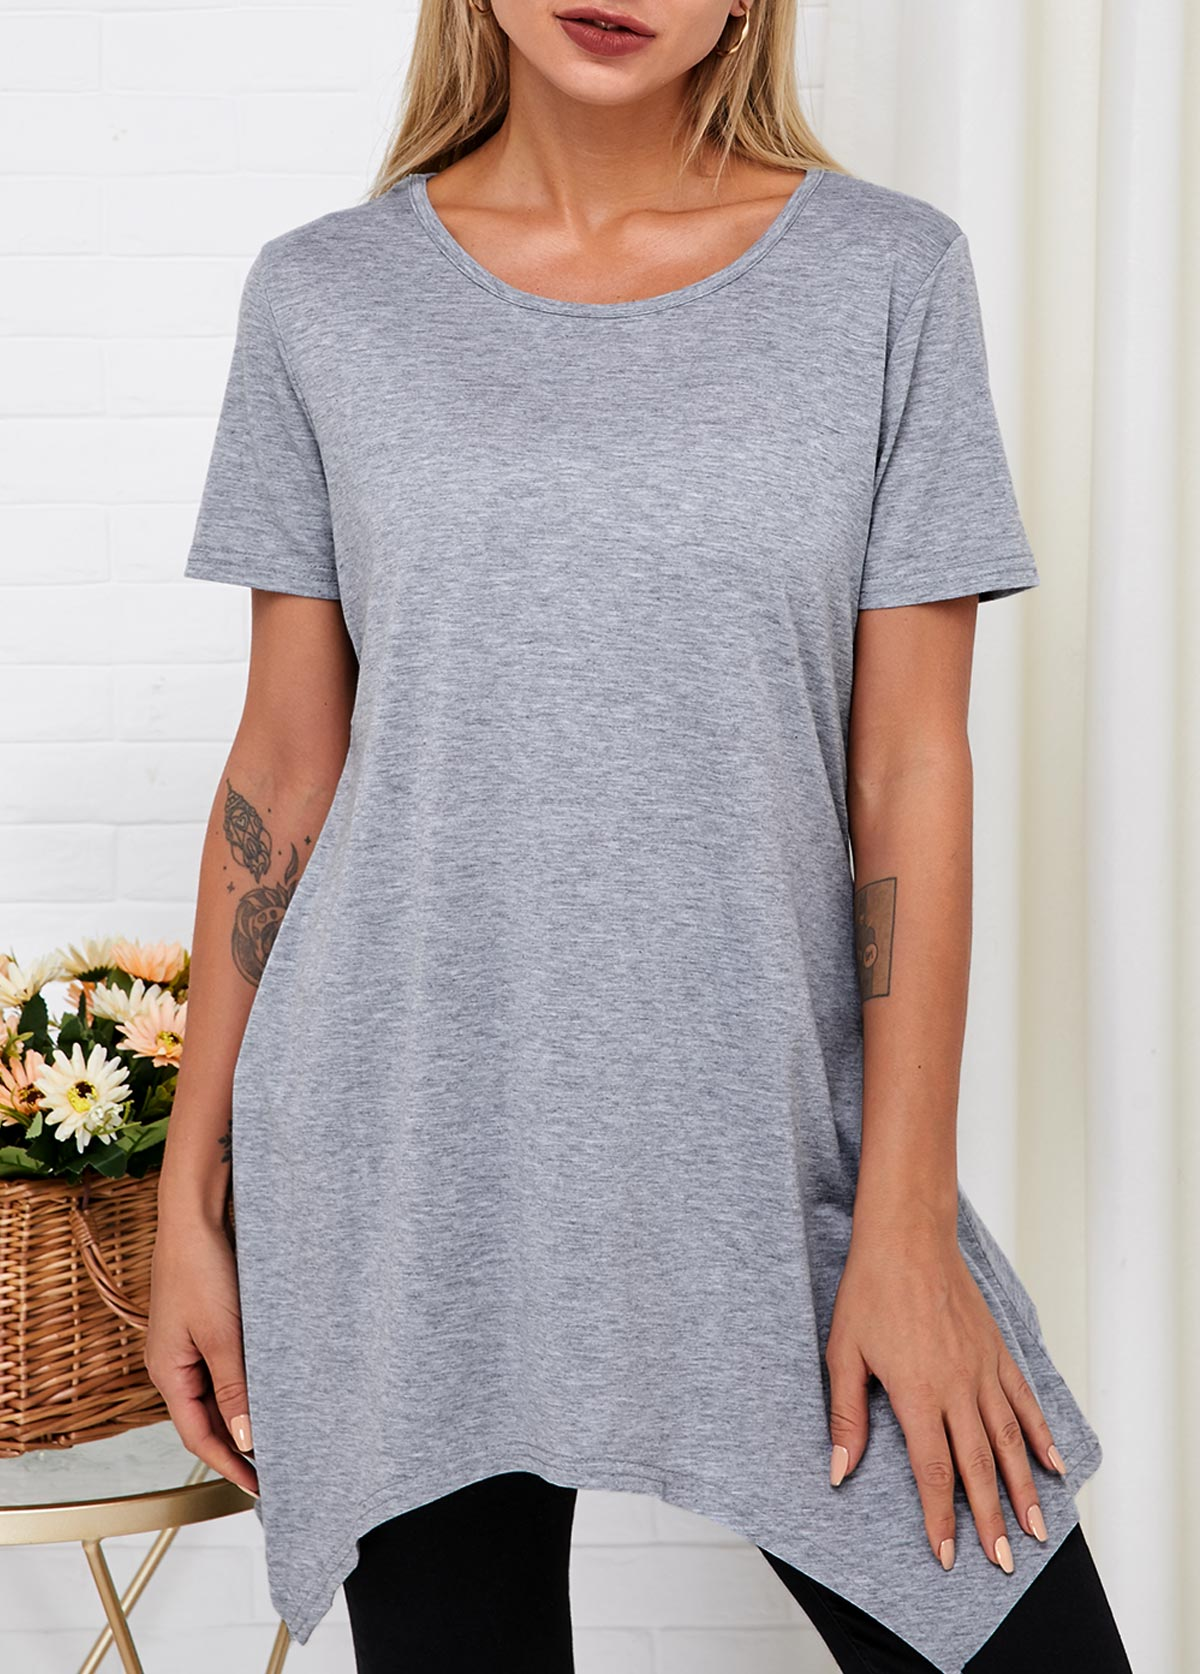 Asymmetric Hem Short Sleeve Round Neck T Shirt